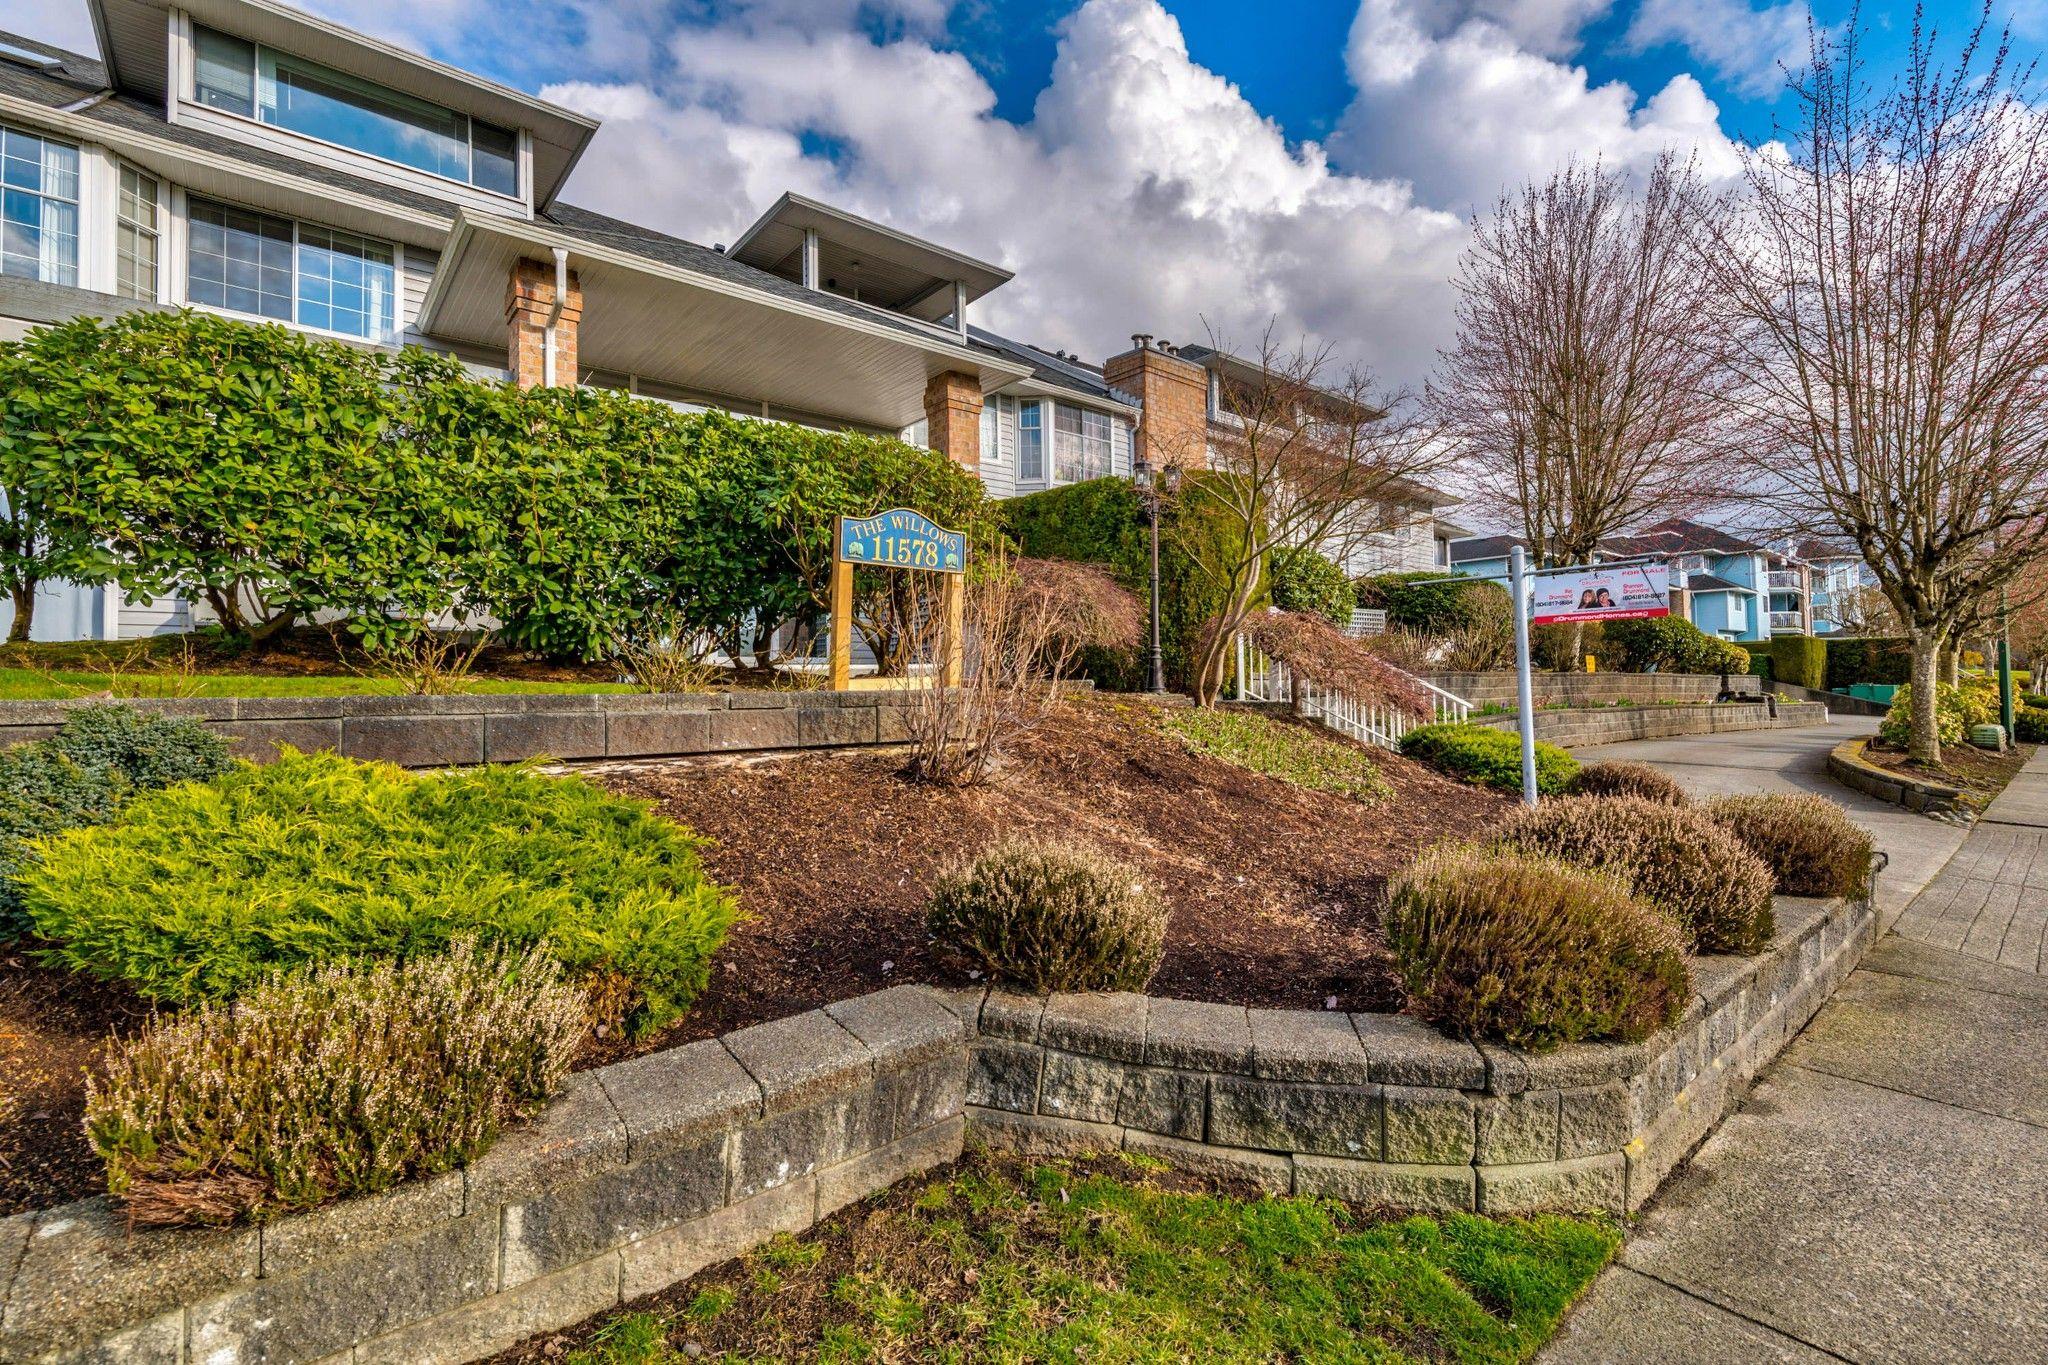 Main Photo: 203 11578 225 STREET in Maple Ridge: Condo for sale : MLS®# R2447700